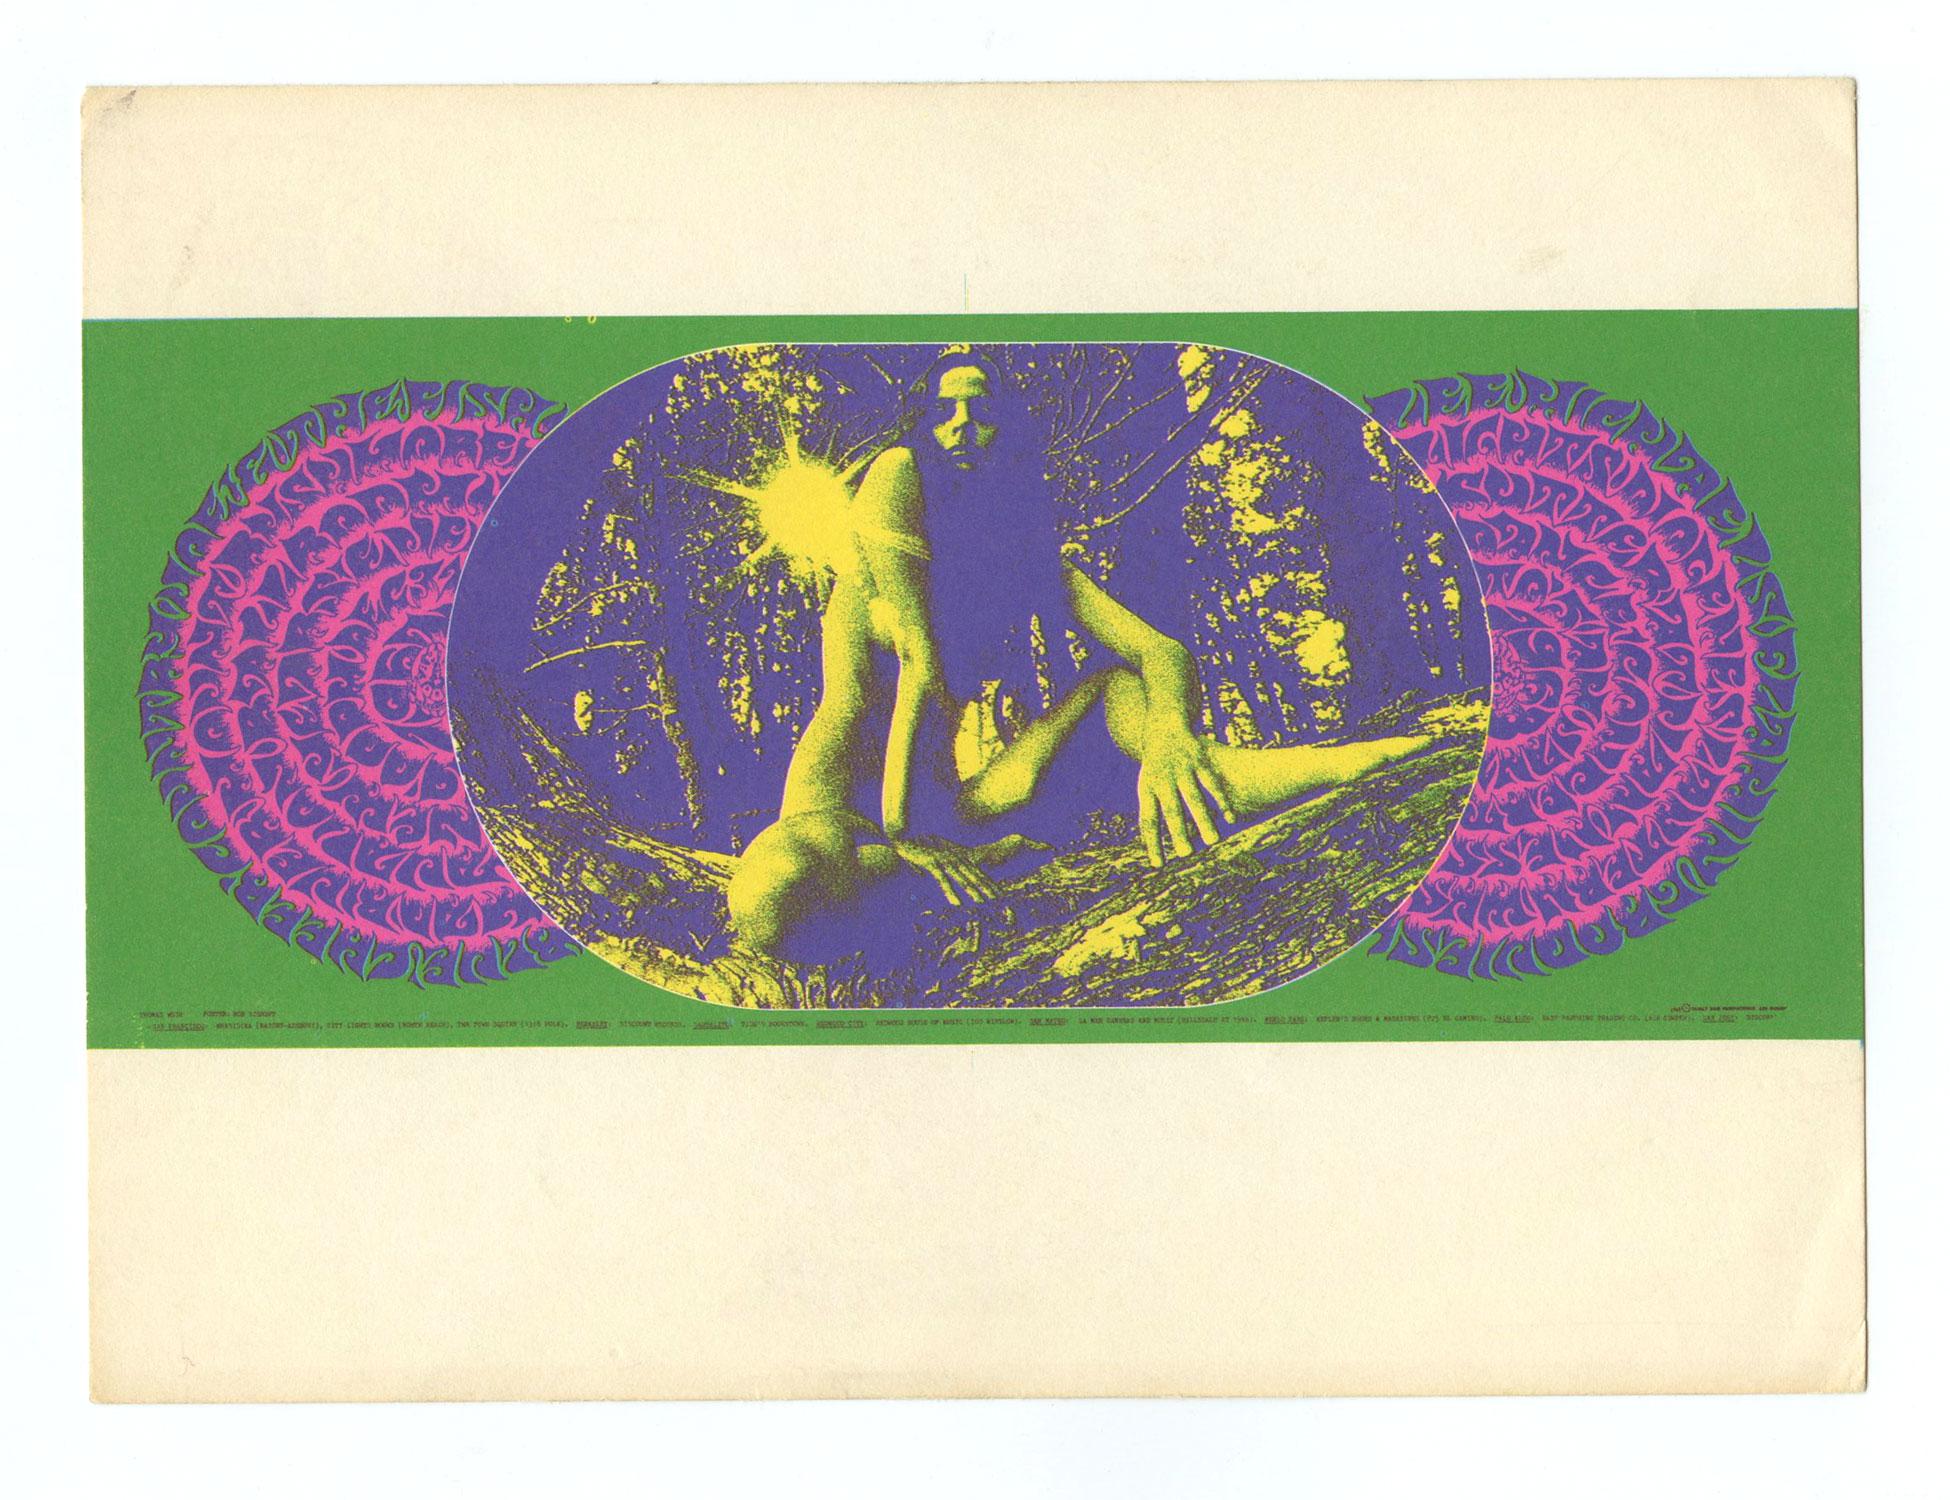 FD  99 Postcard Blue Cheer Lee Michaels 1967 Dec 31